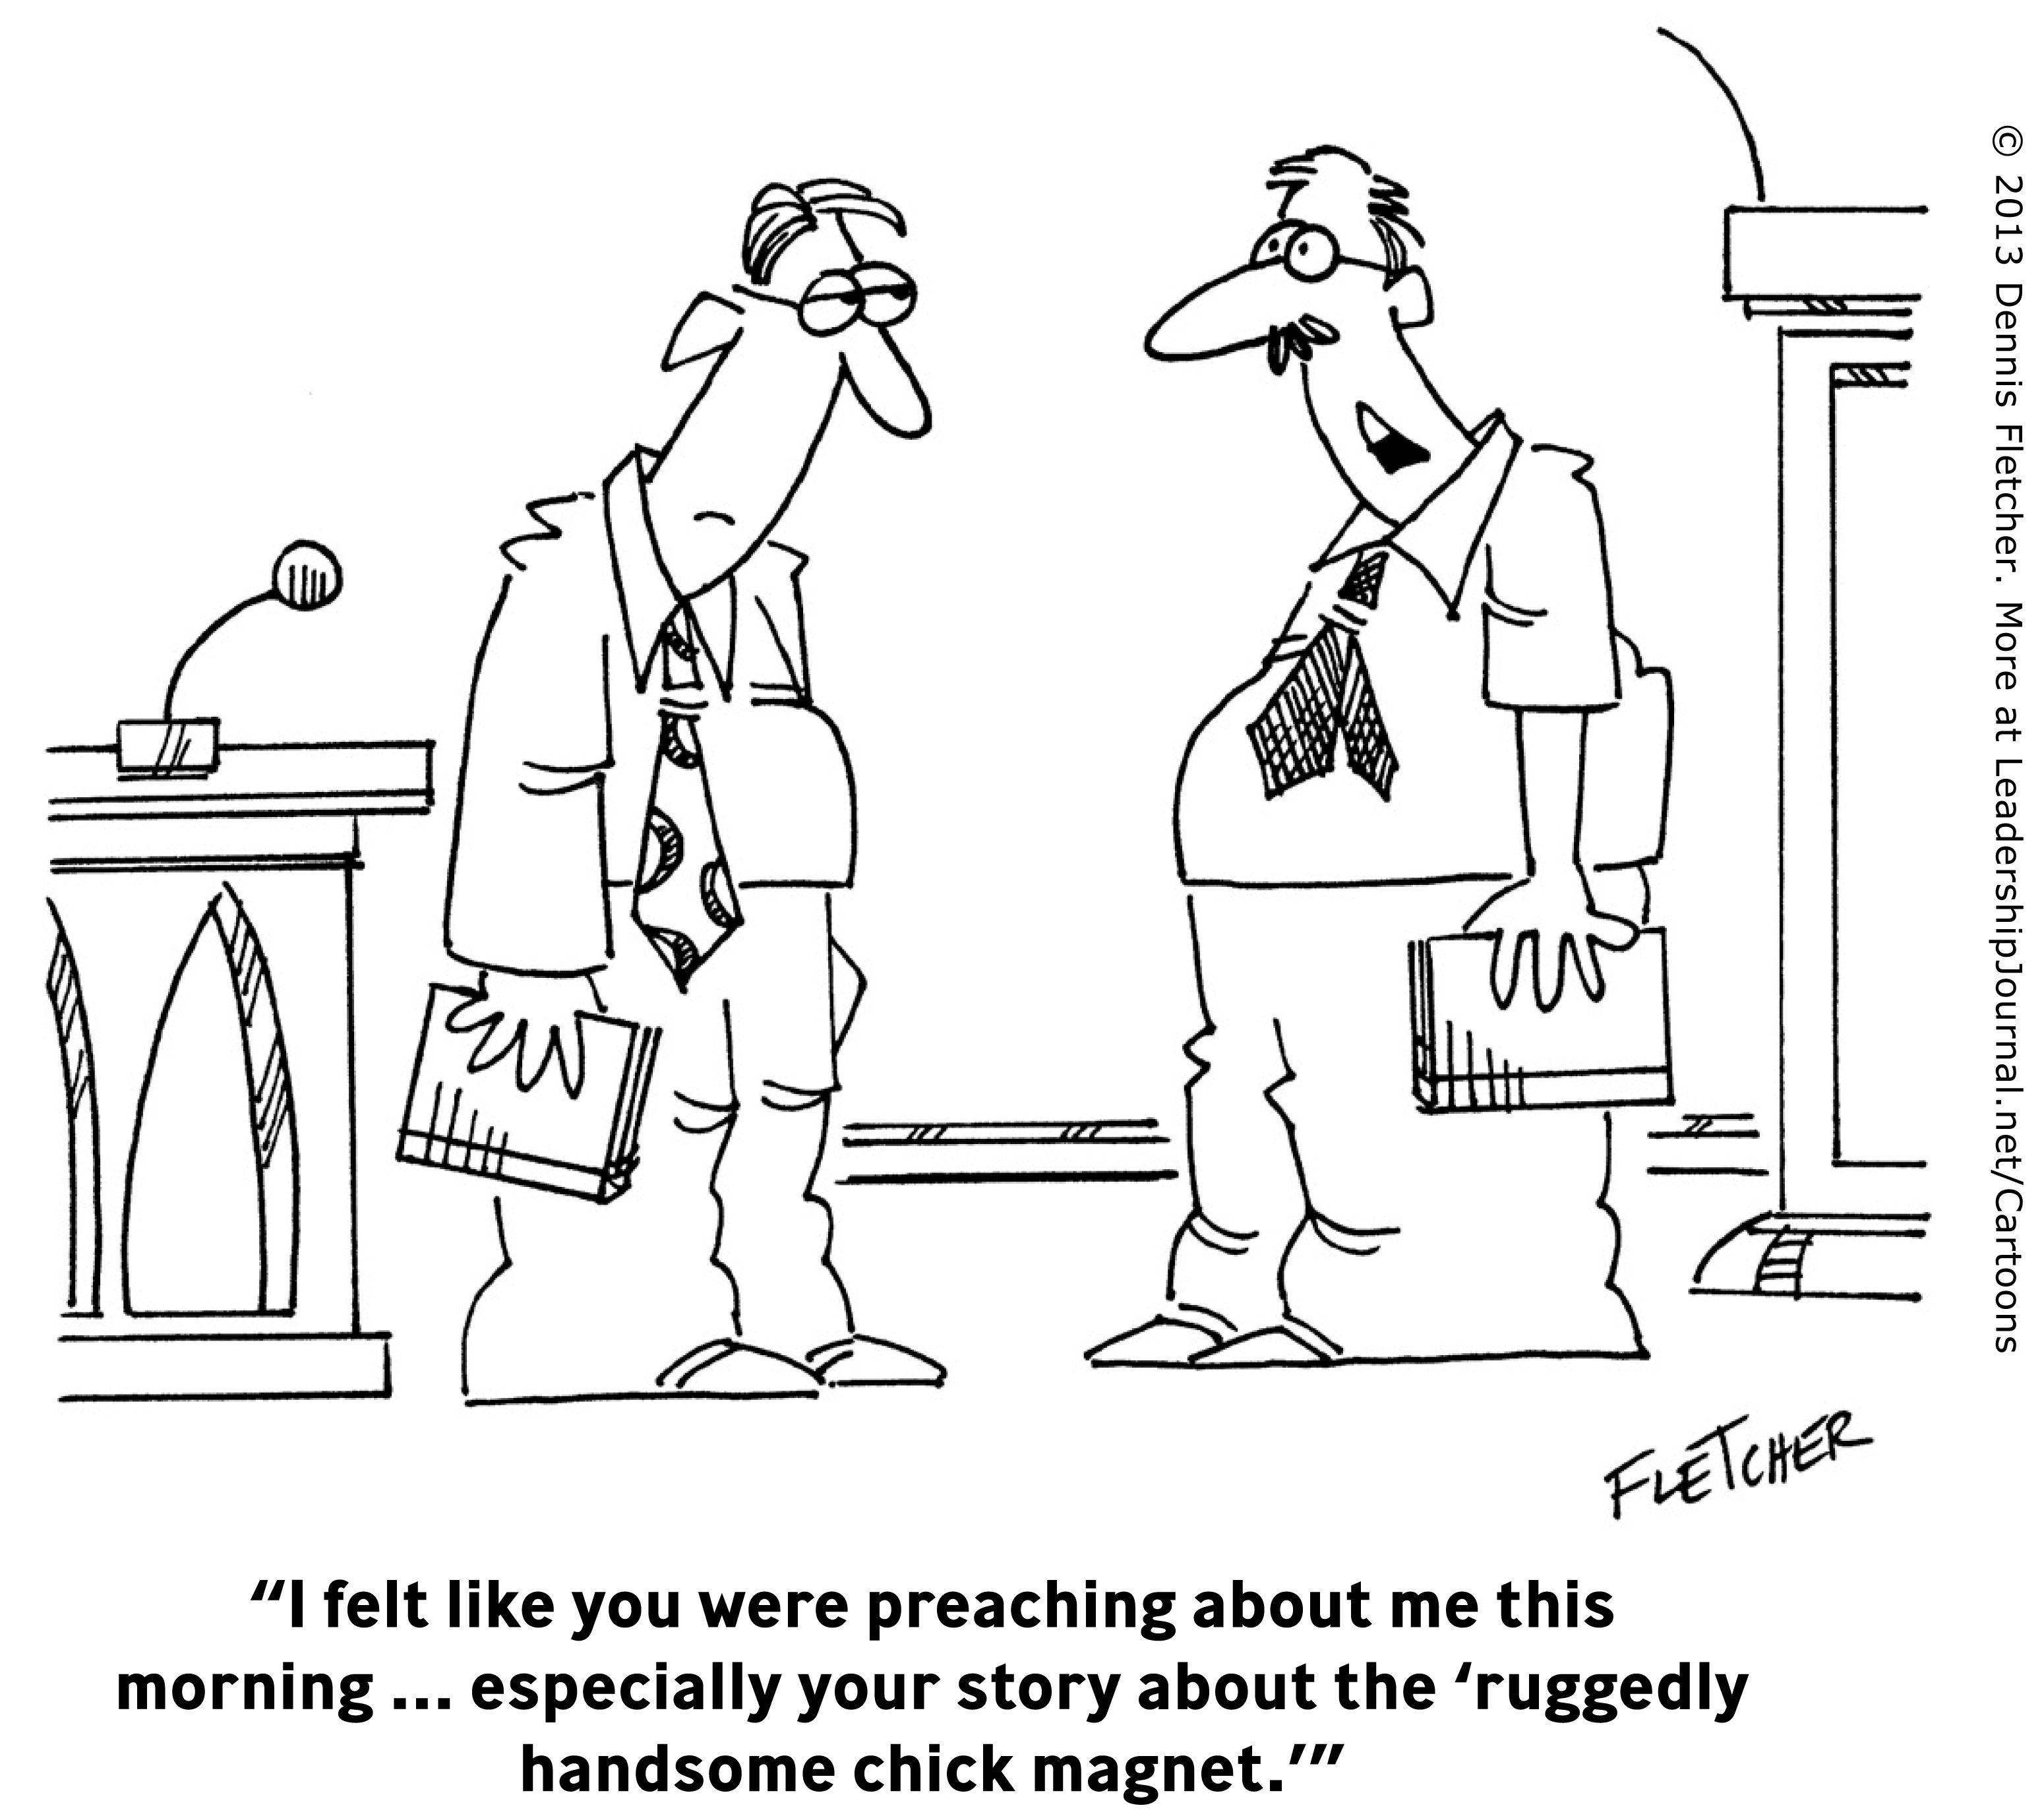 Pin on Religion - Humor